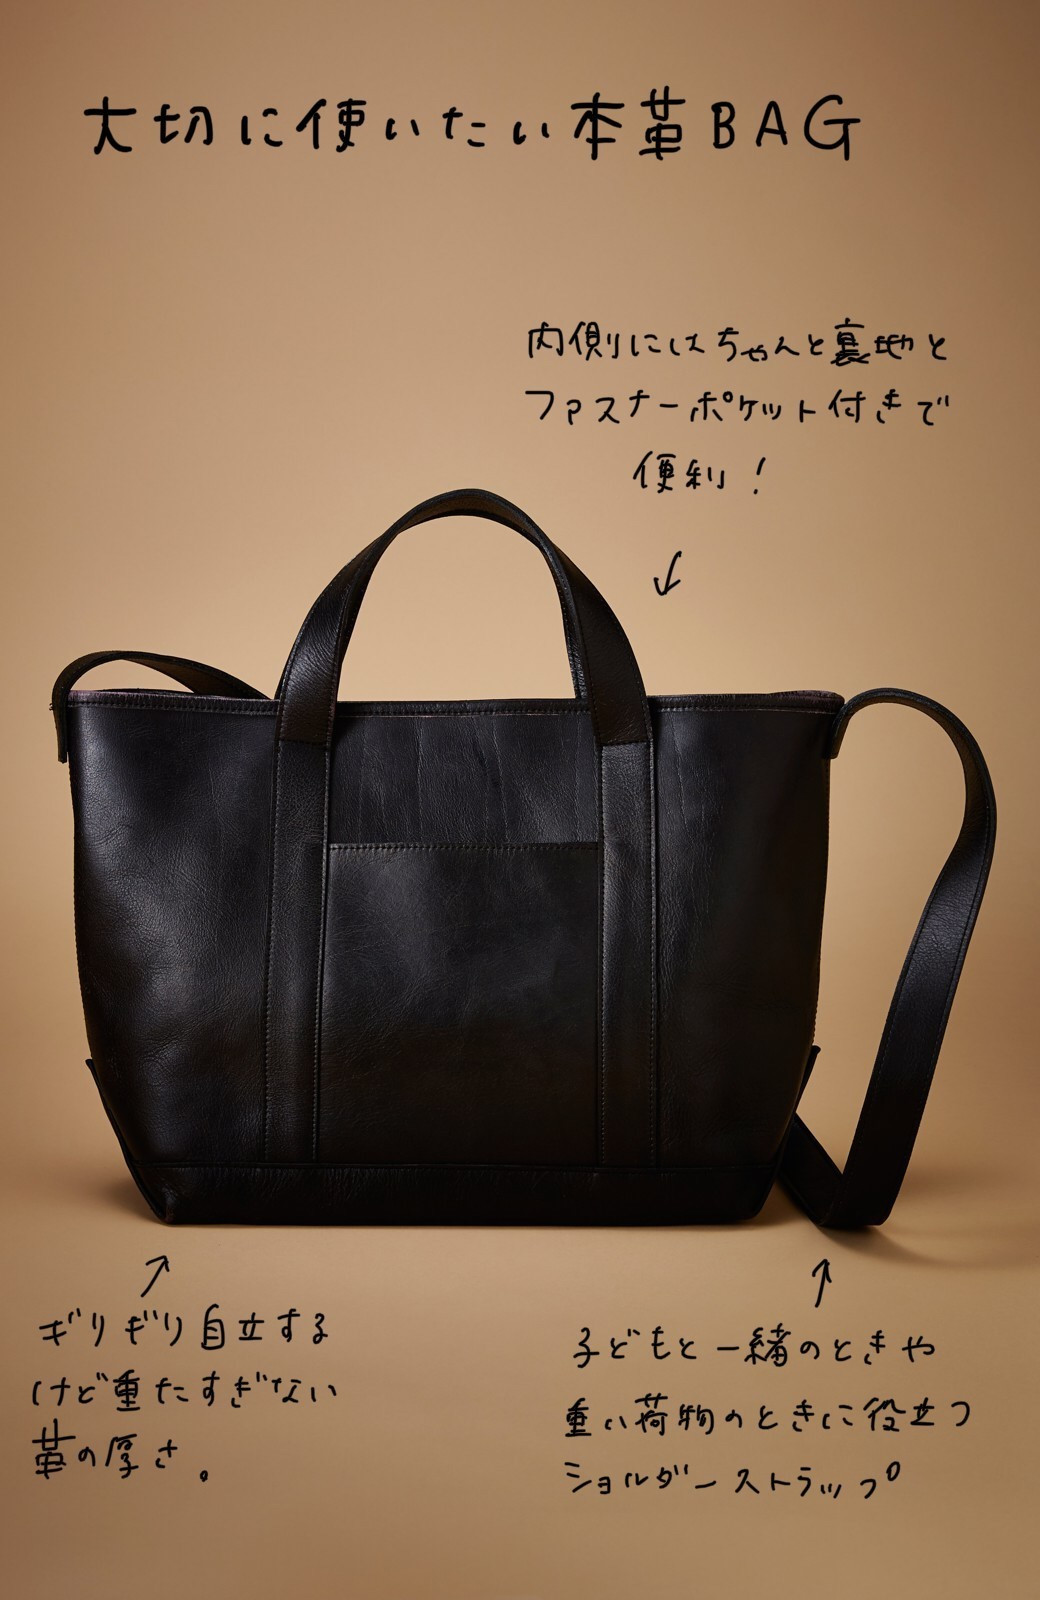 haco! made in JAPAN の本革トートバッグ(ショルダー付き) by que made me <ブラック>の商品写真2